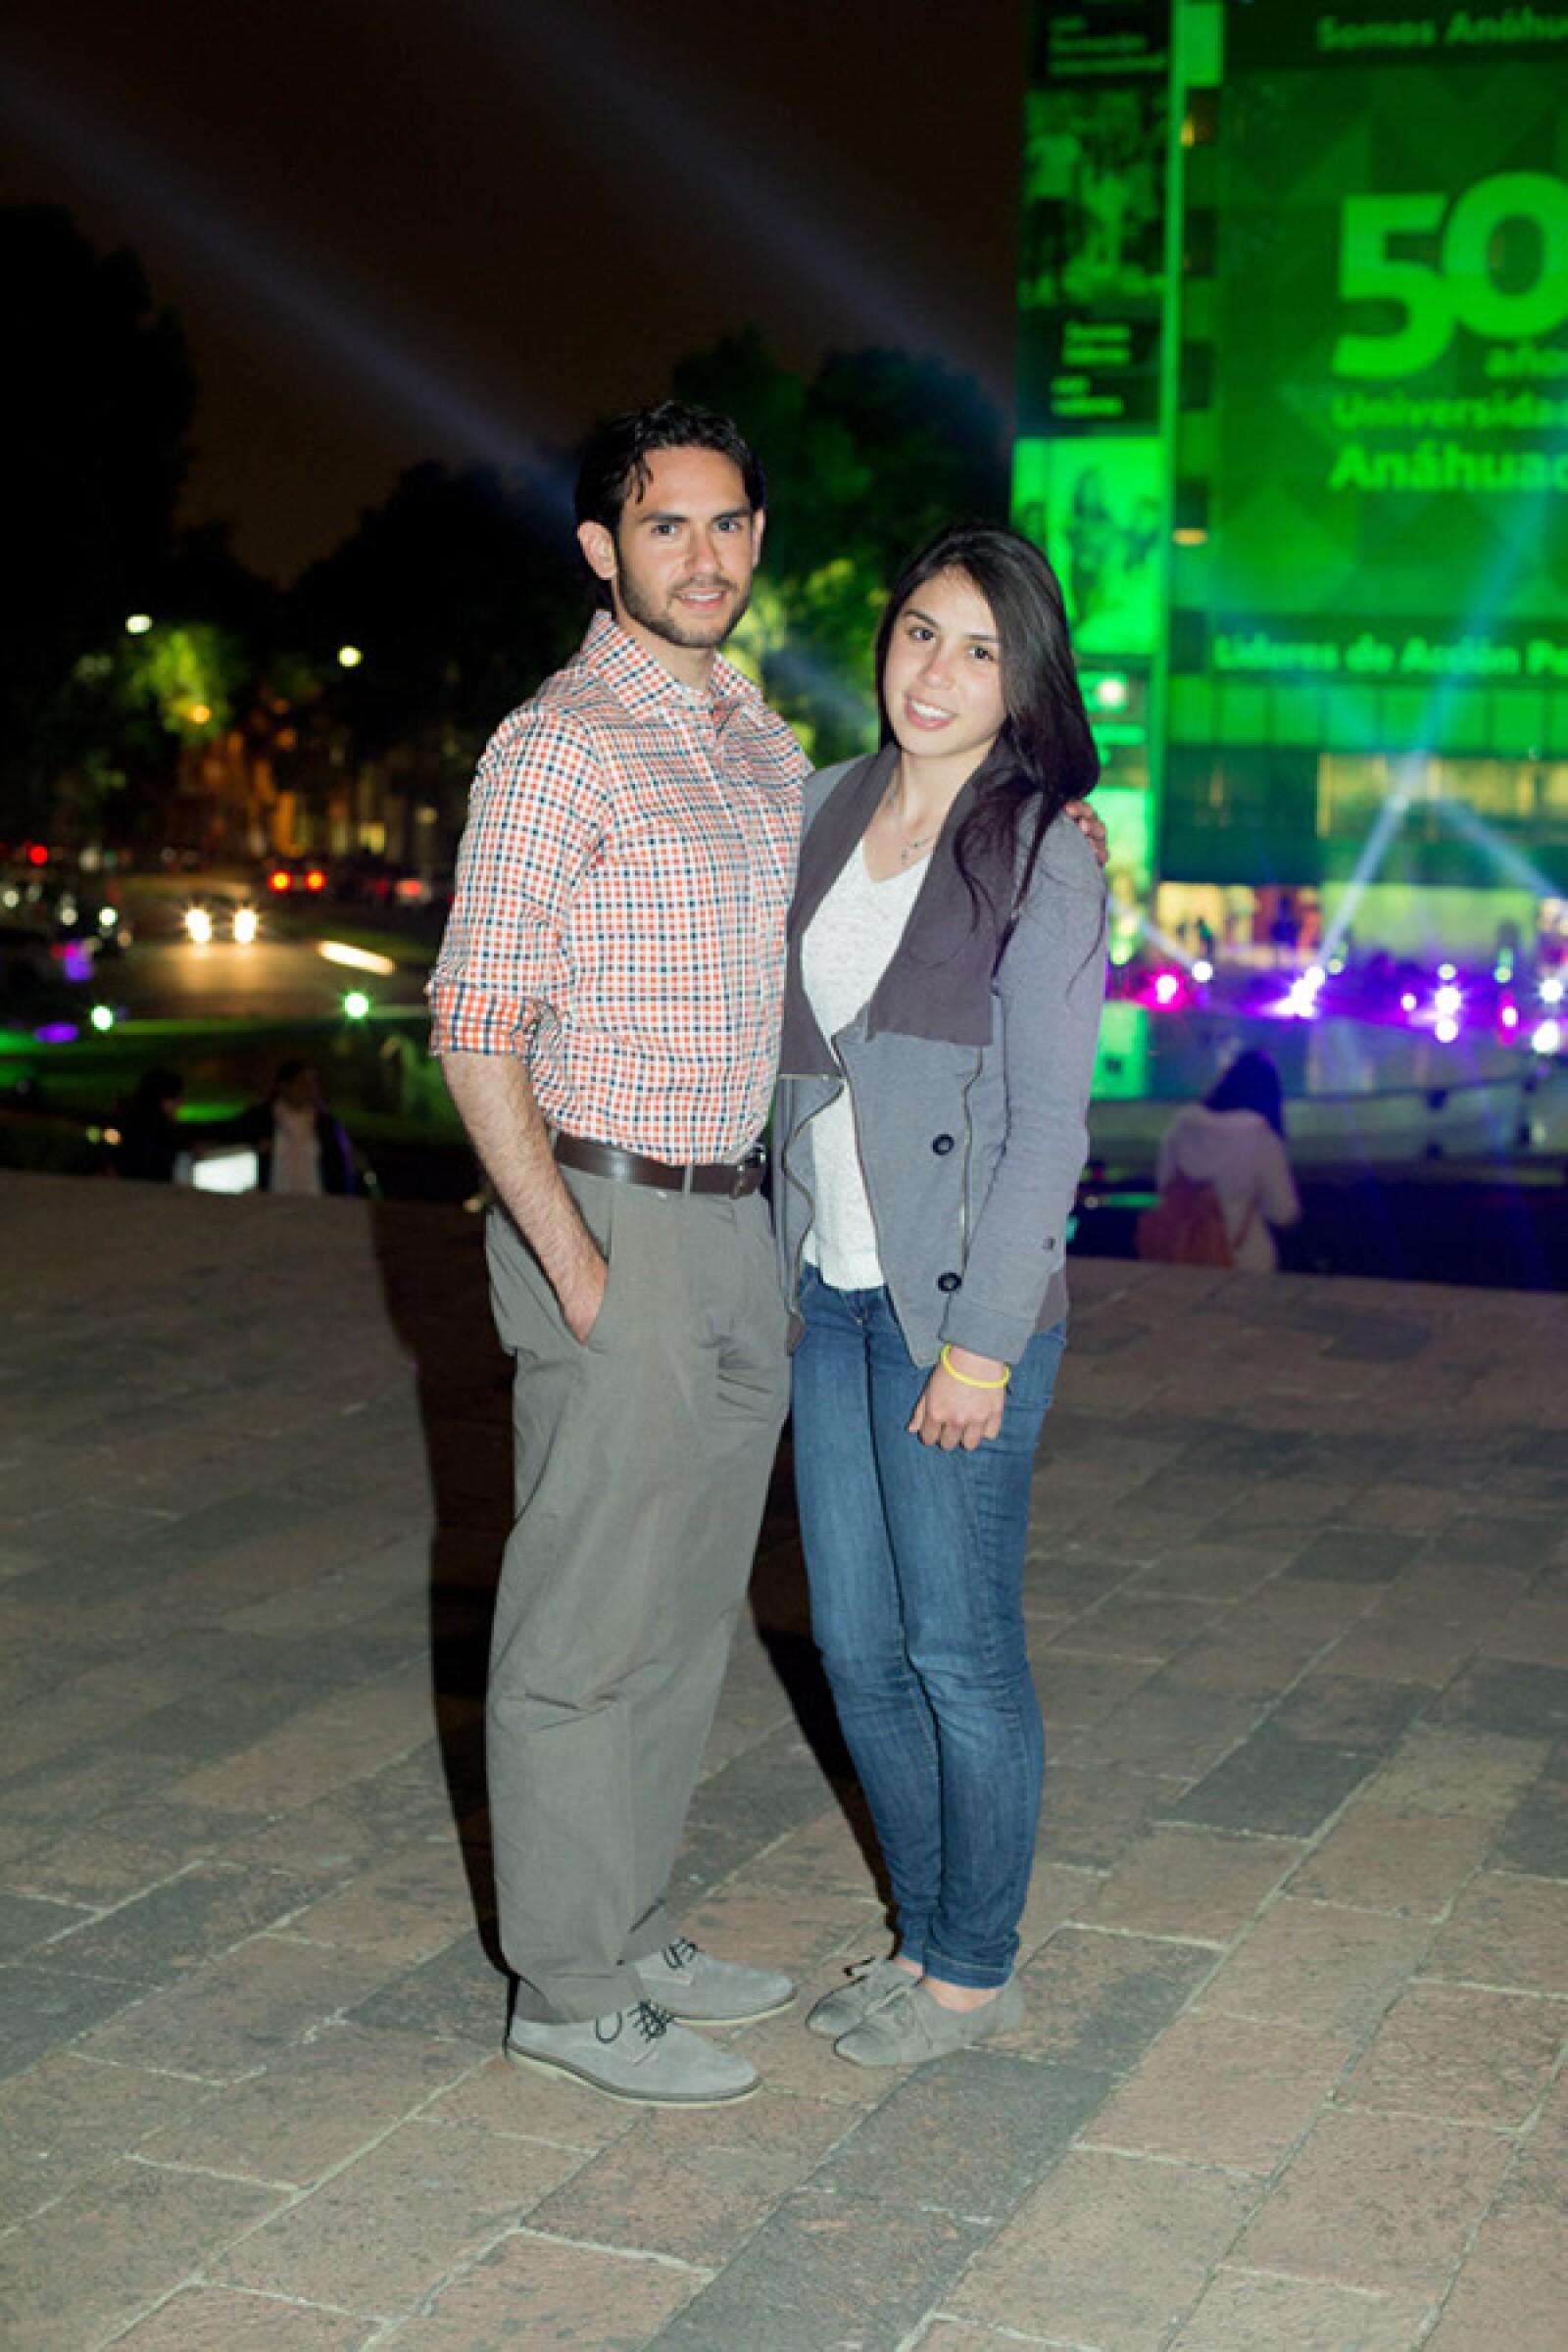 David Massarano y Mercedes Sánchez